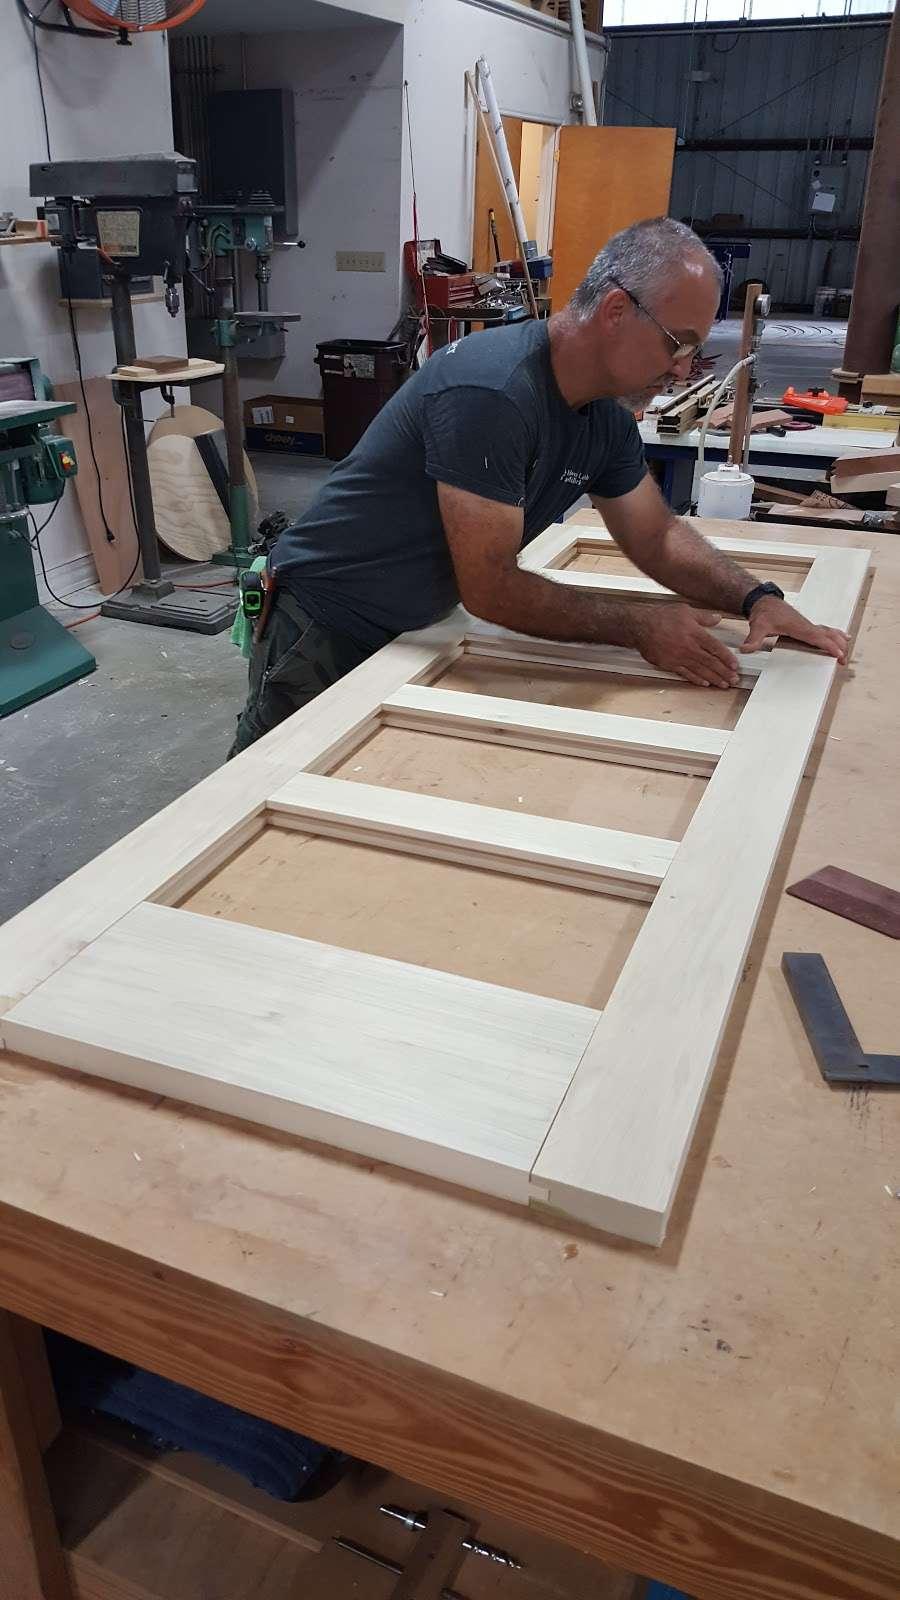 Hardwood Lumber & Millwork - store  | Photo 4 of 10 | Address: 4316 Wallace Rd, Lakeland, FL 33812, USA | Phone: (863) 646-8681